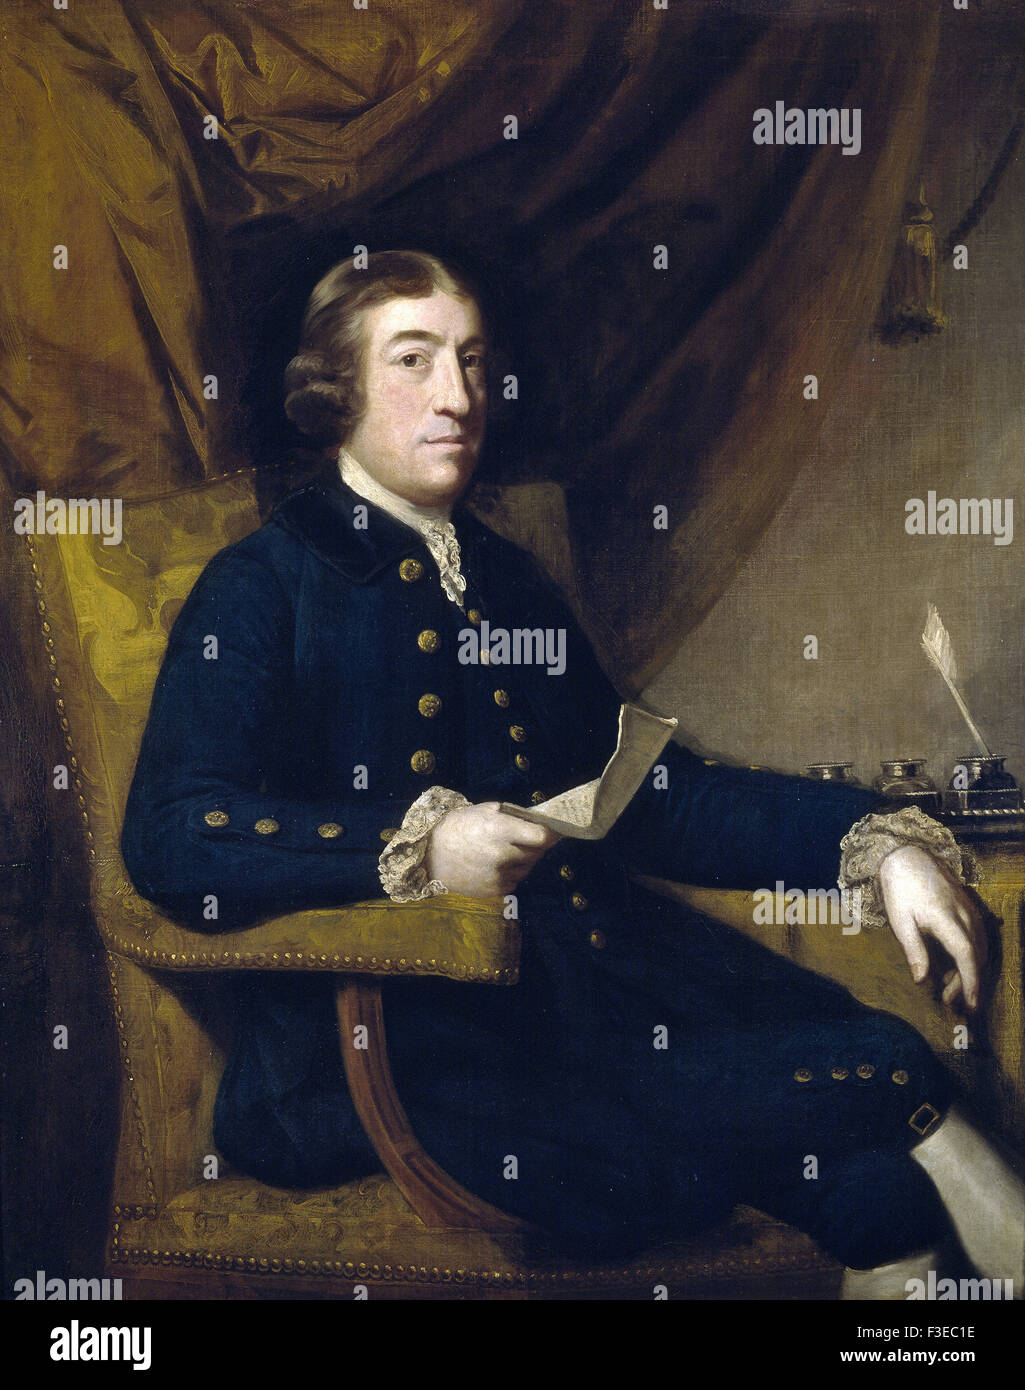 Sir Joshua Reynolds - Mr. James Bourdieu - Stock Image